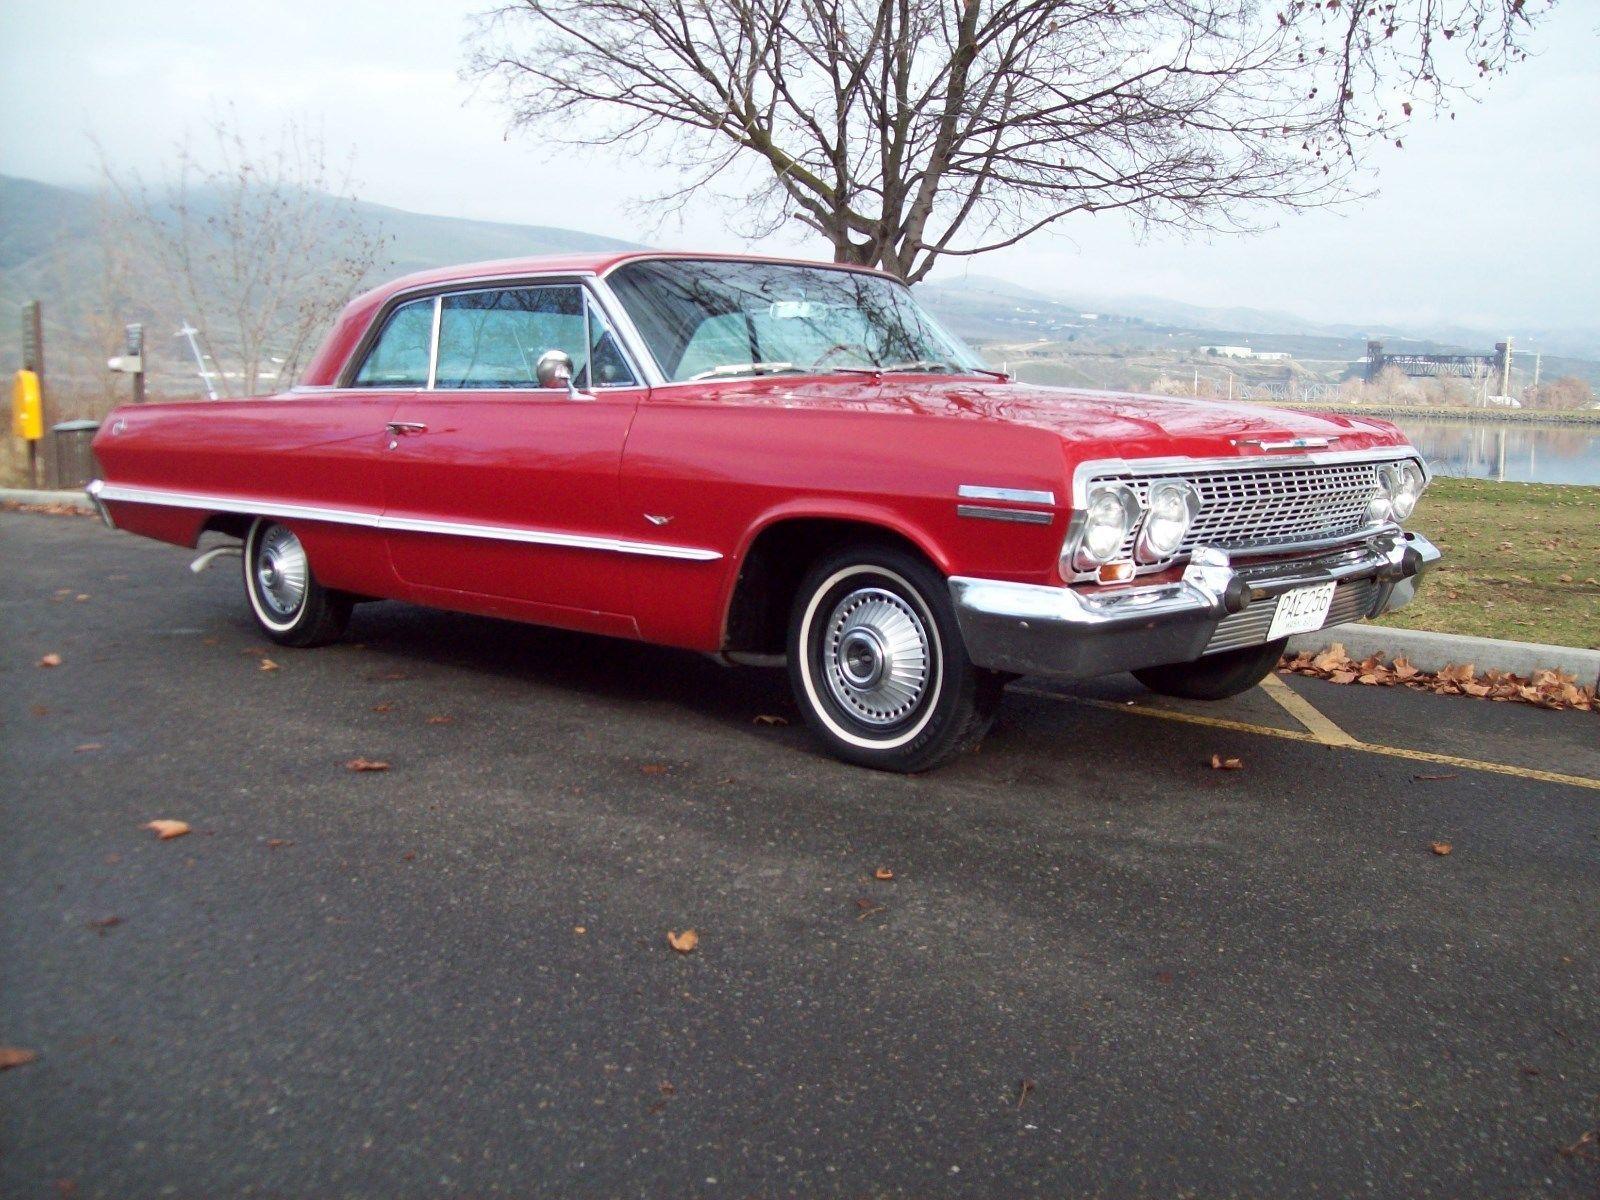 Awesome Great 1963 Chevrolet Impala 2 DOOR HARDTOP 1963 CHEVY IMPALA ...